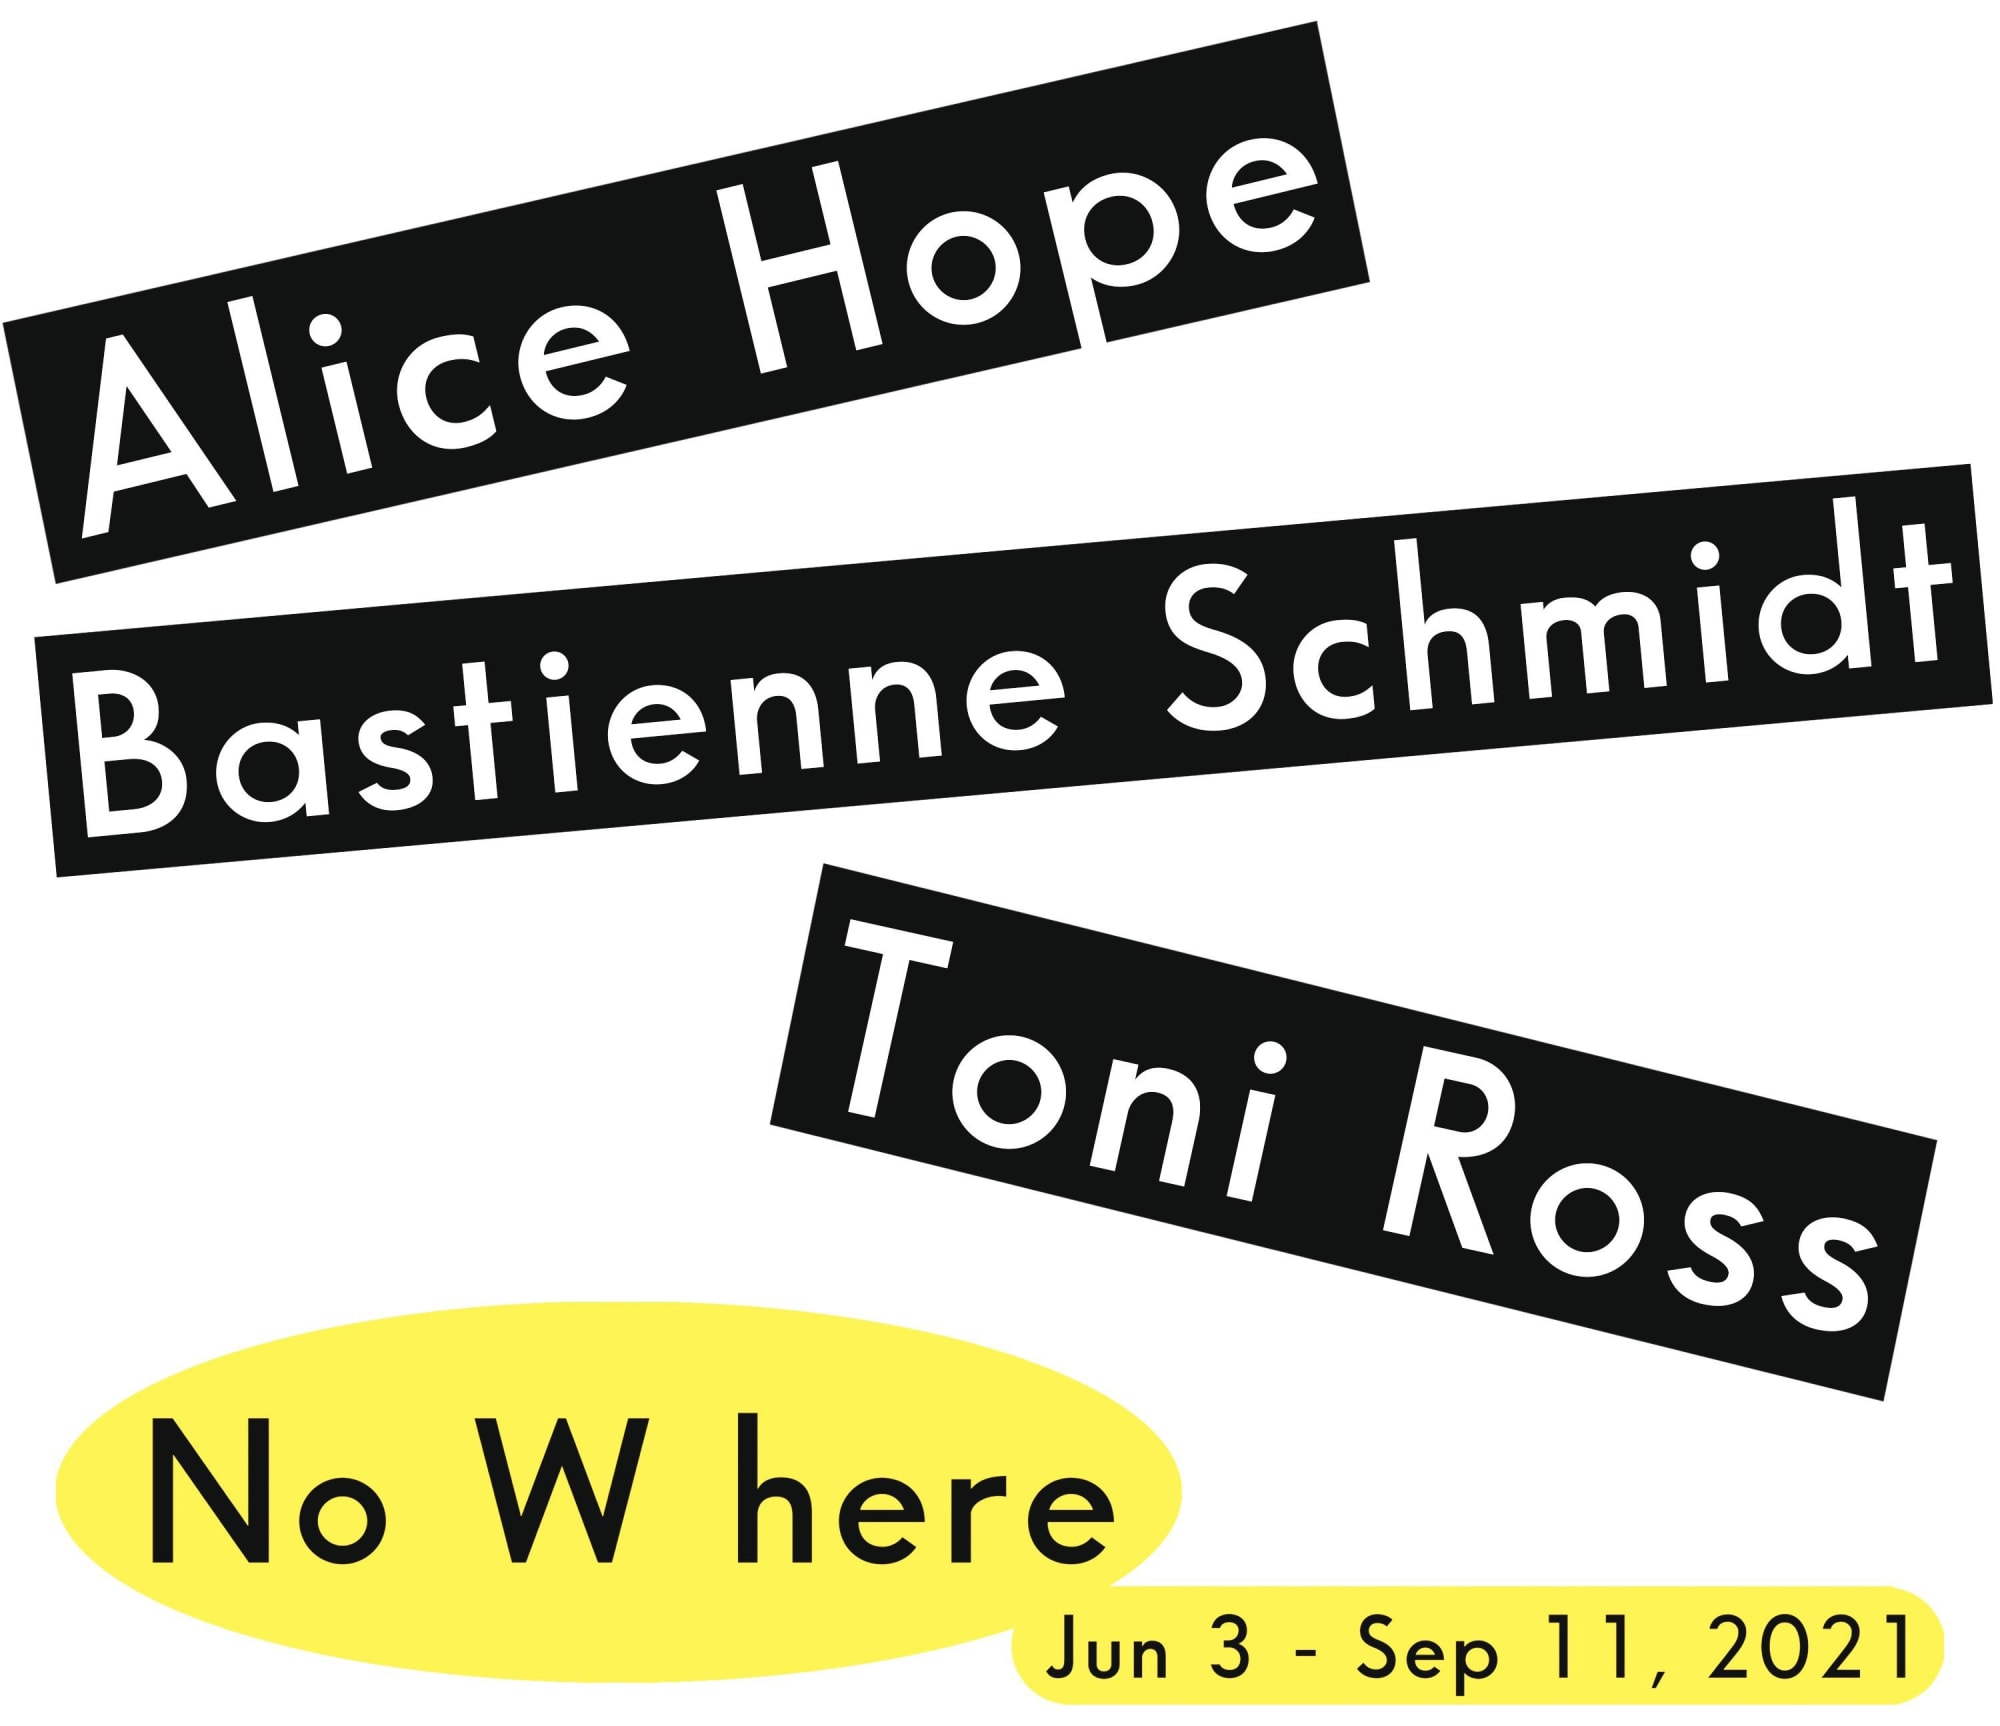 No W here: Alice Hope, Bastienne Schmidt, Toni Ross